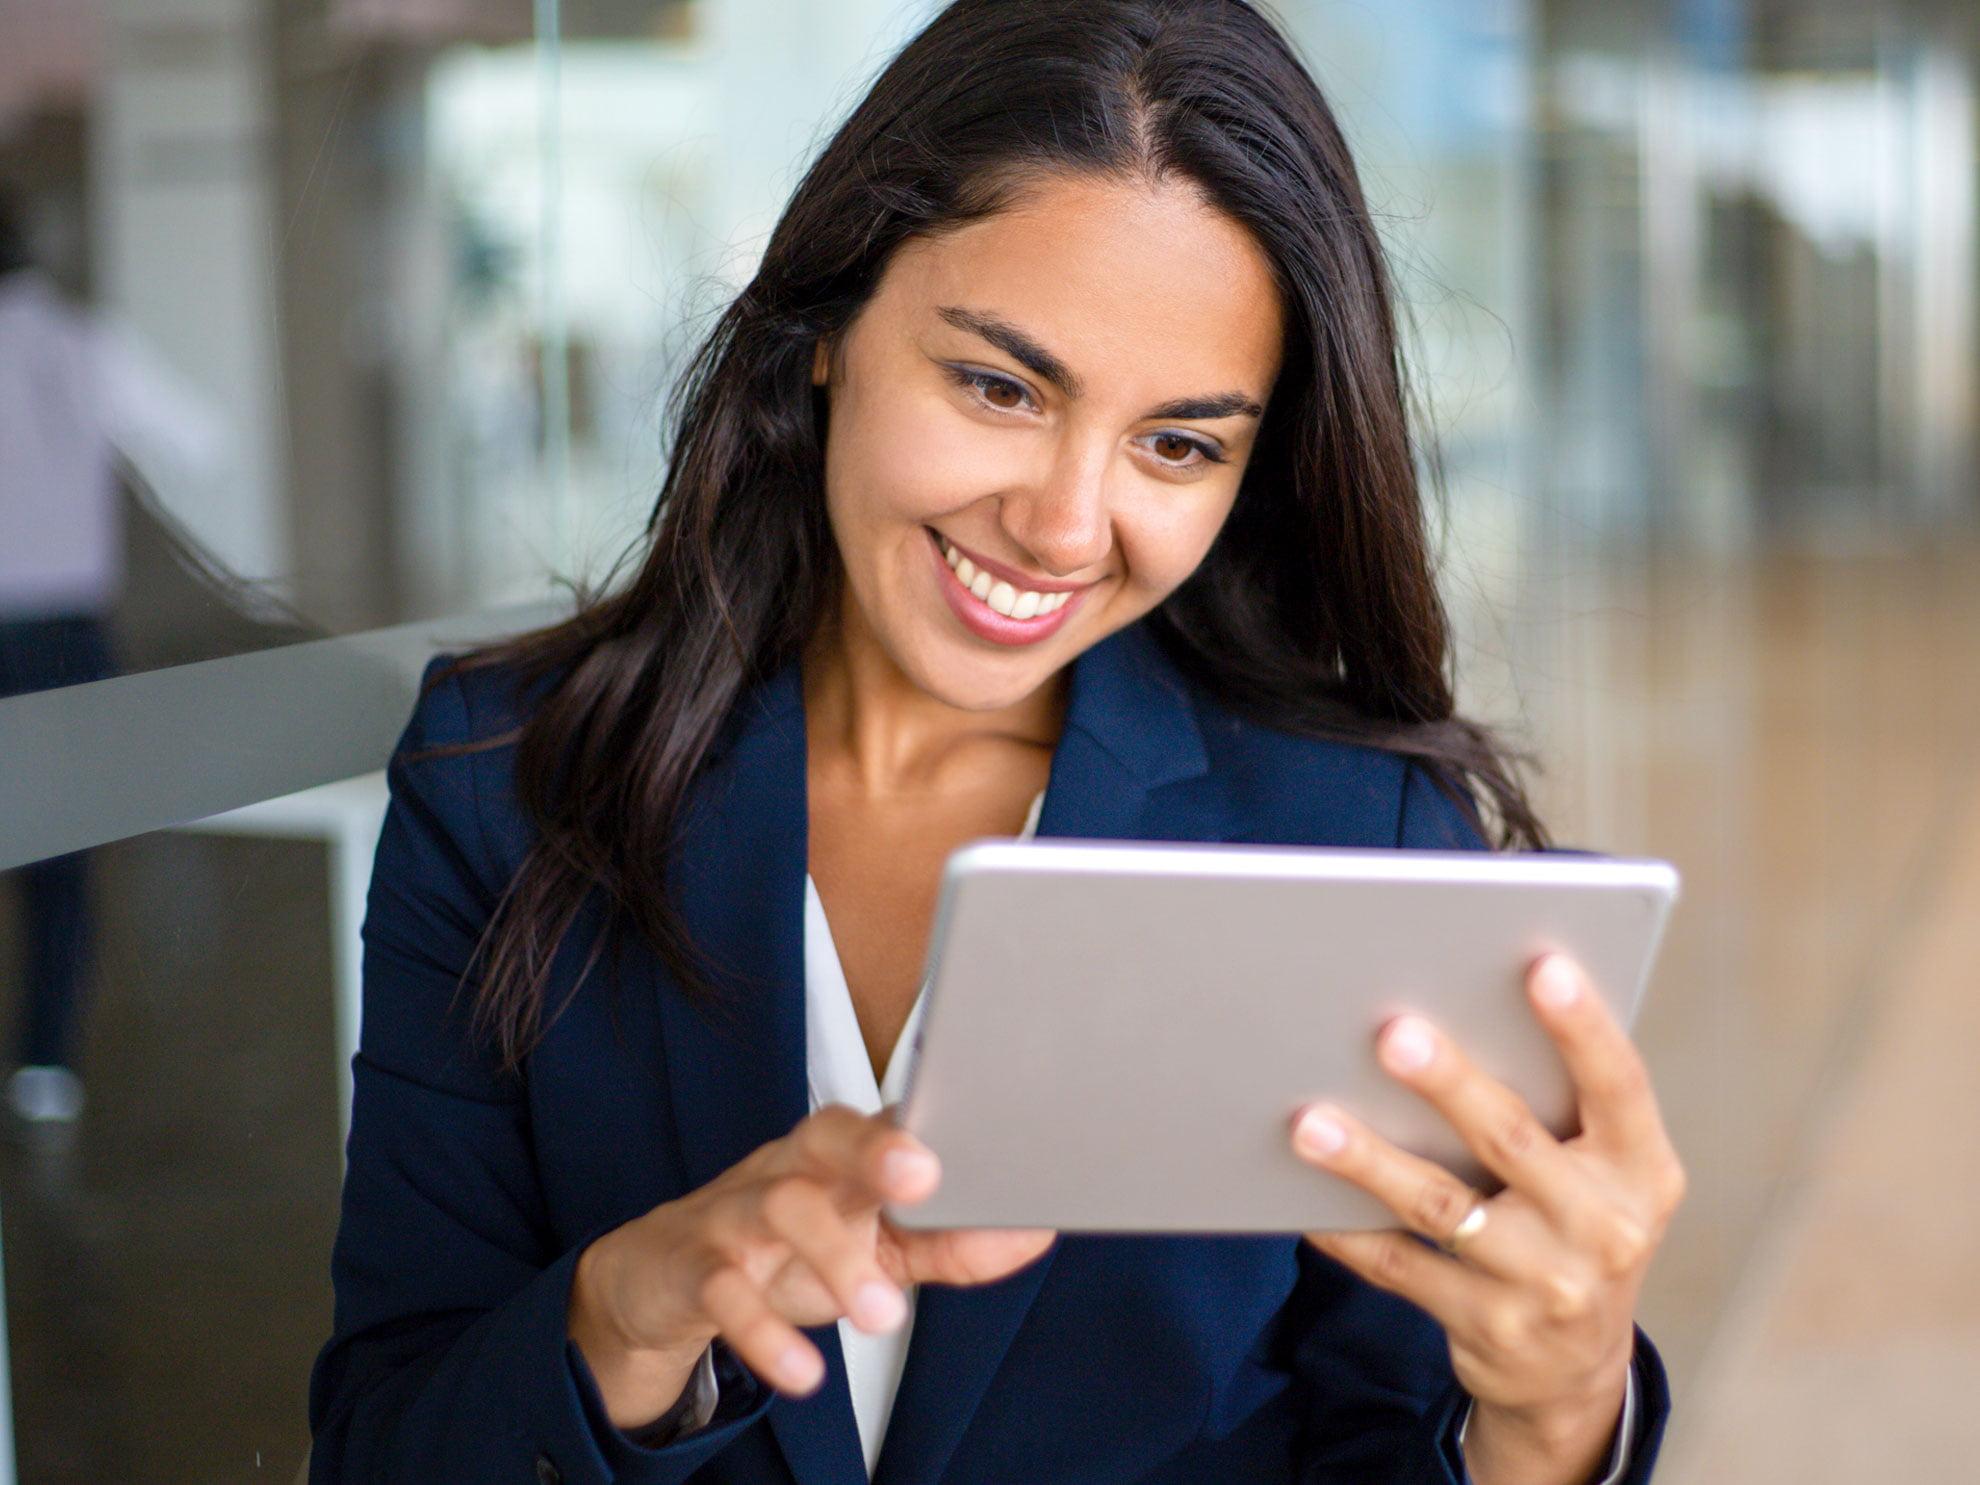 app-gestione-spazi-lavorativi